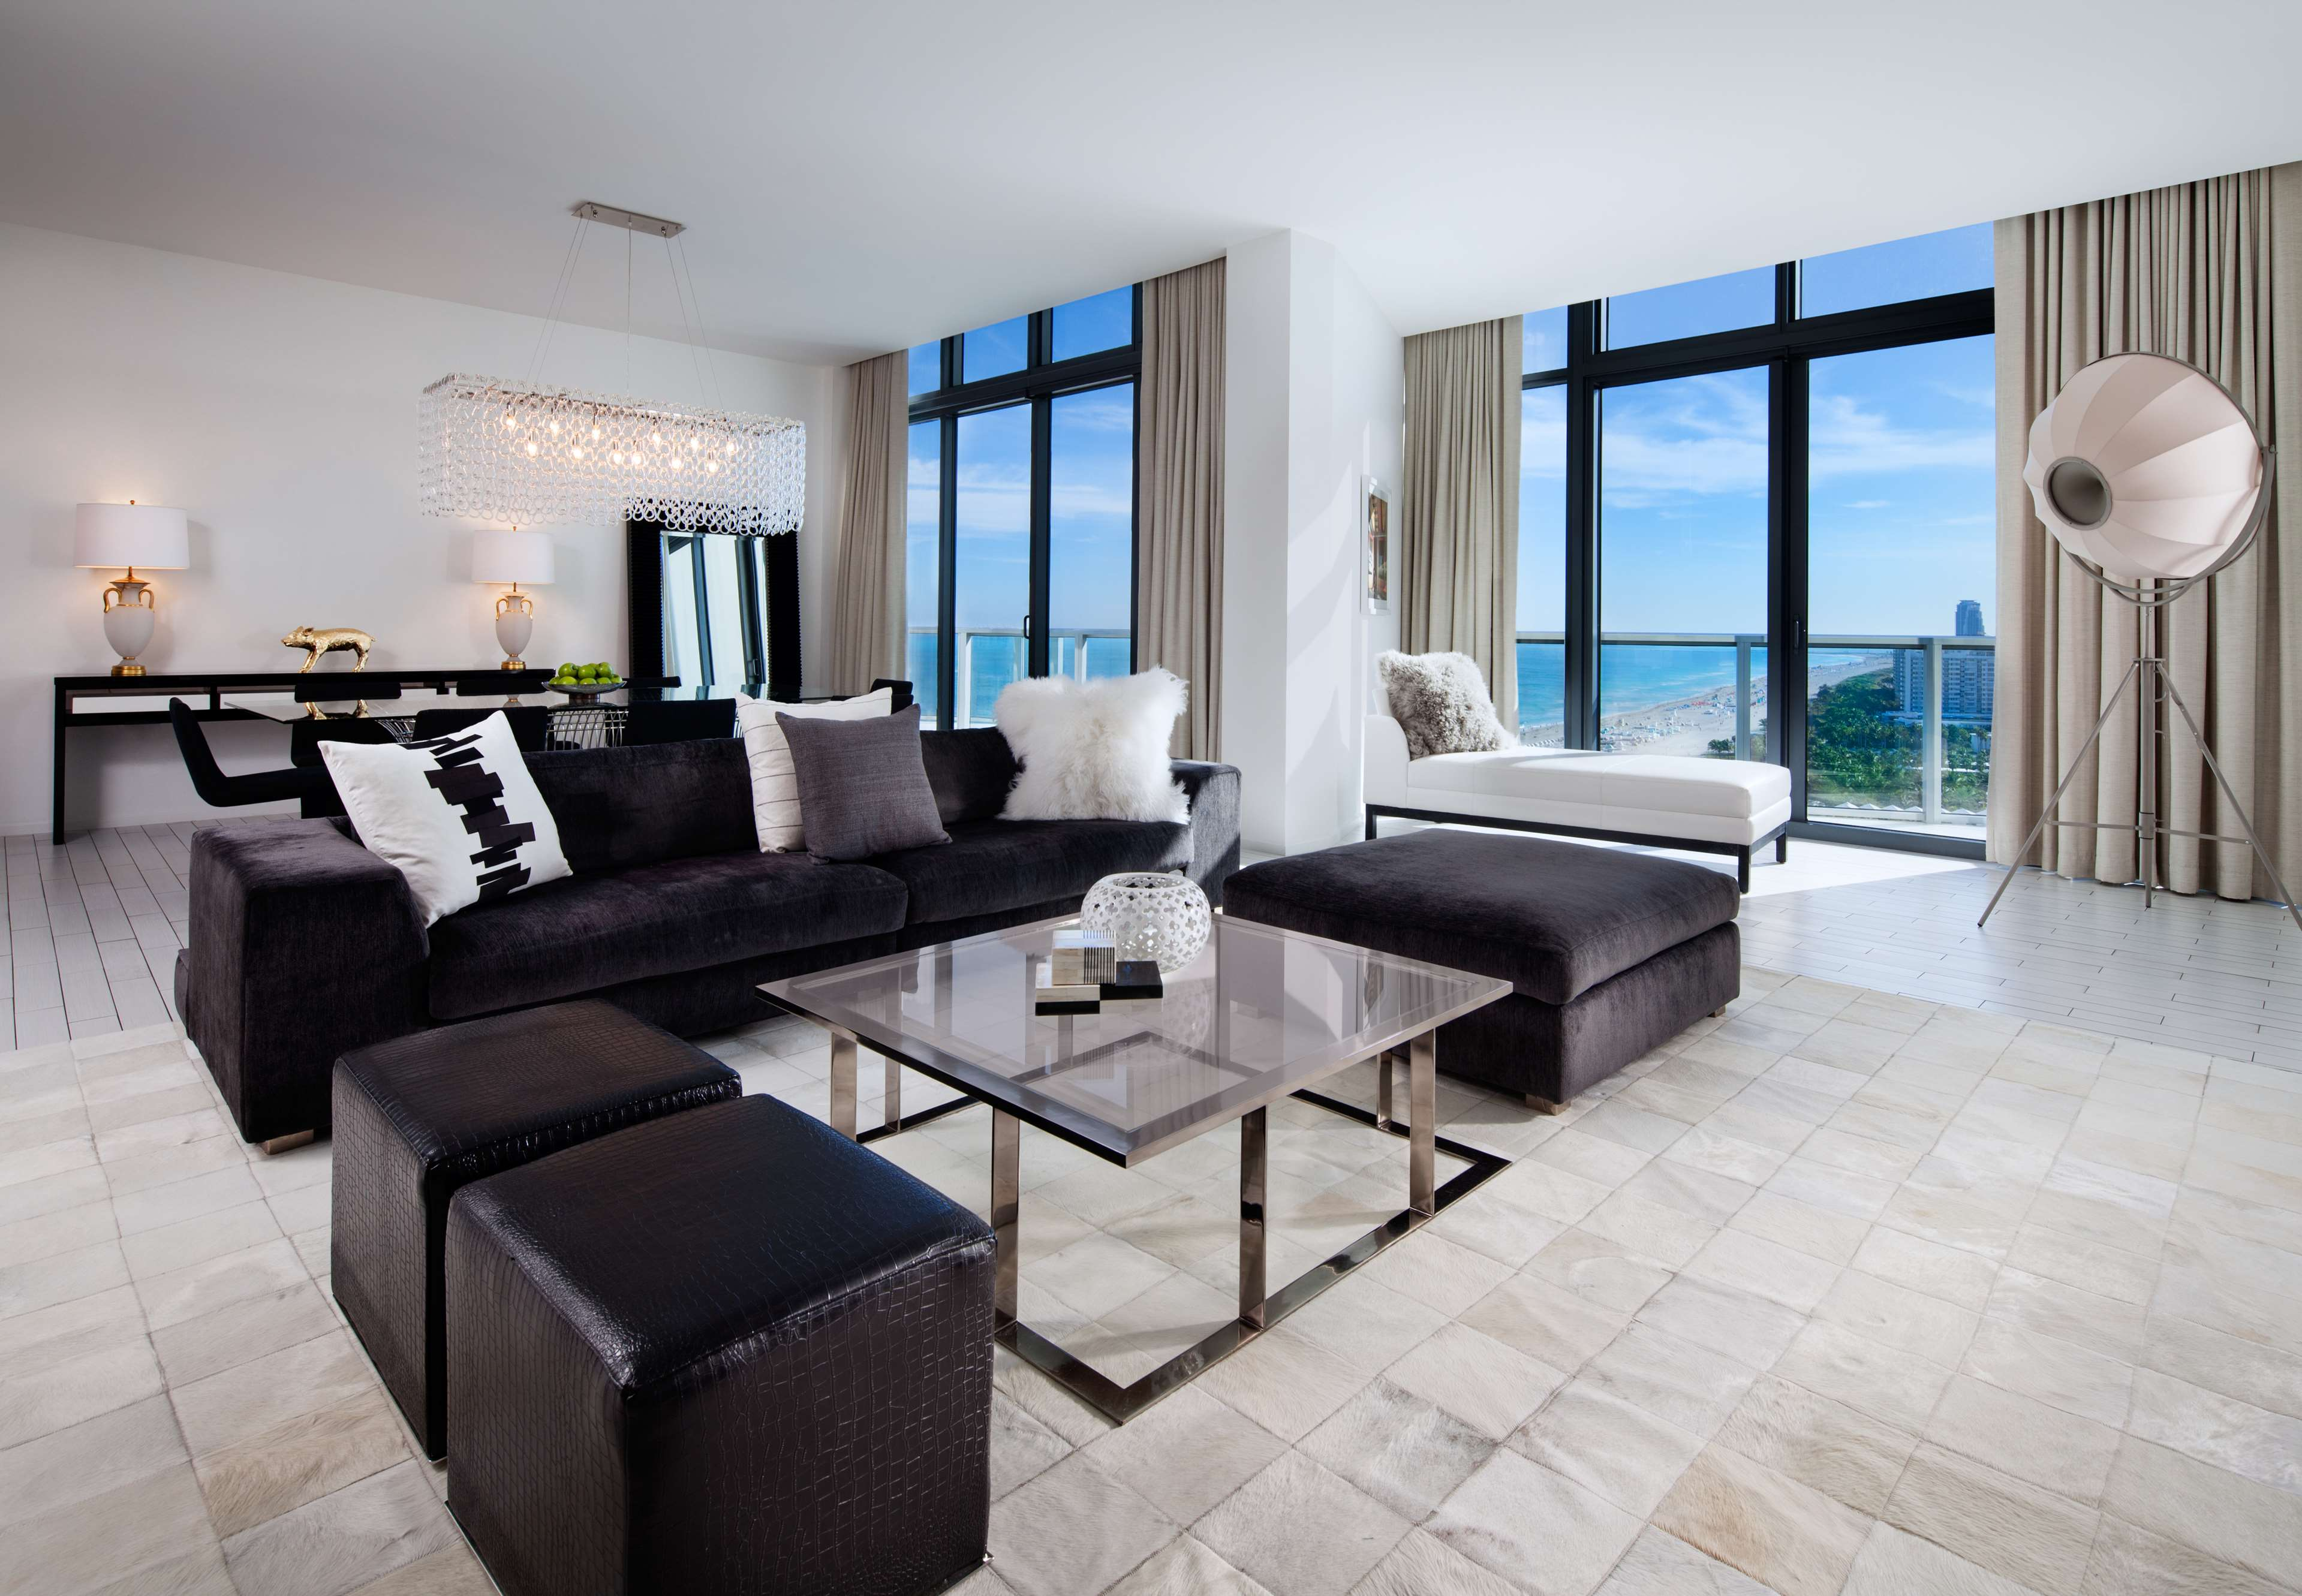 W south beach miami beach florida fl for W living room miami